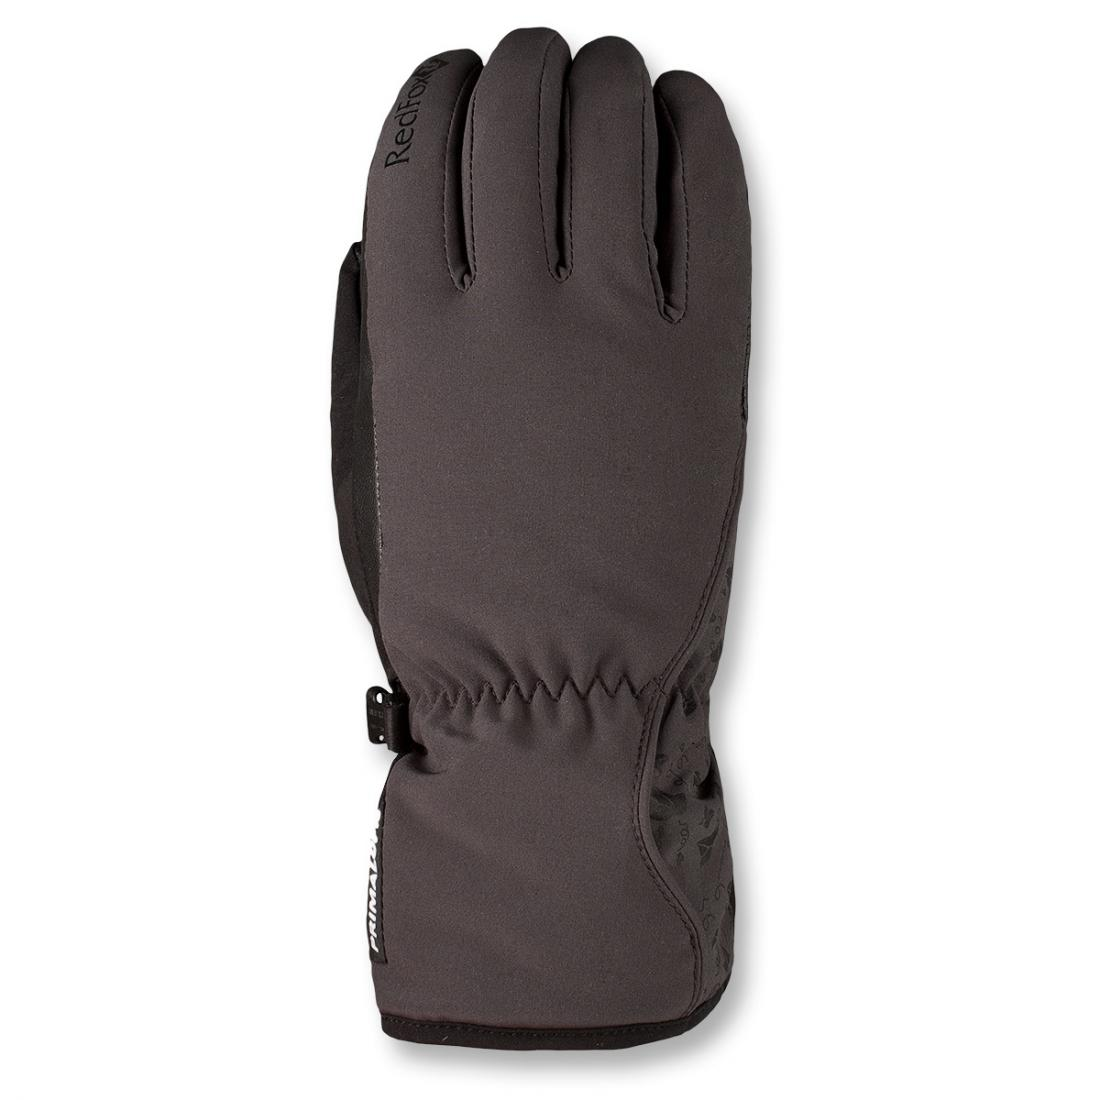 Перчатки женские RozaryПерчатки<br><br> Женская версия зимних прогулочных перчаток с утеплителем Primaloft®.<br><br><br> <br><br><br><br><br> Материал – Nylon DWR.<br><br> <br><br><br> Утеплитель – Primaloft®.<br><br> <br><br><br> Вставки, препятствующ...<br><br>Цвет: Черный<br>Размер: L